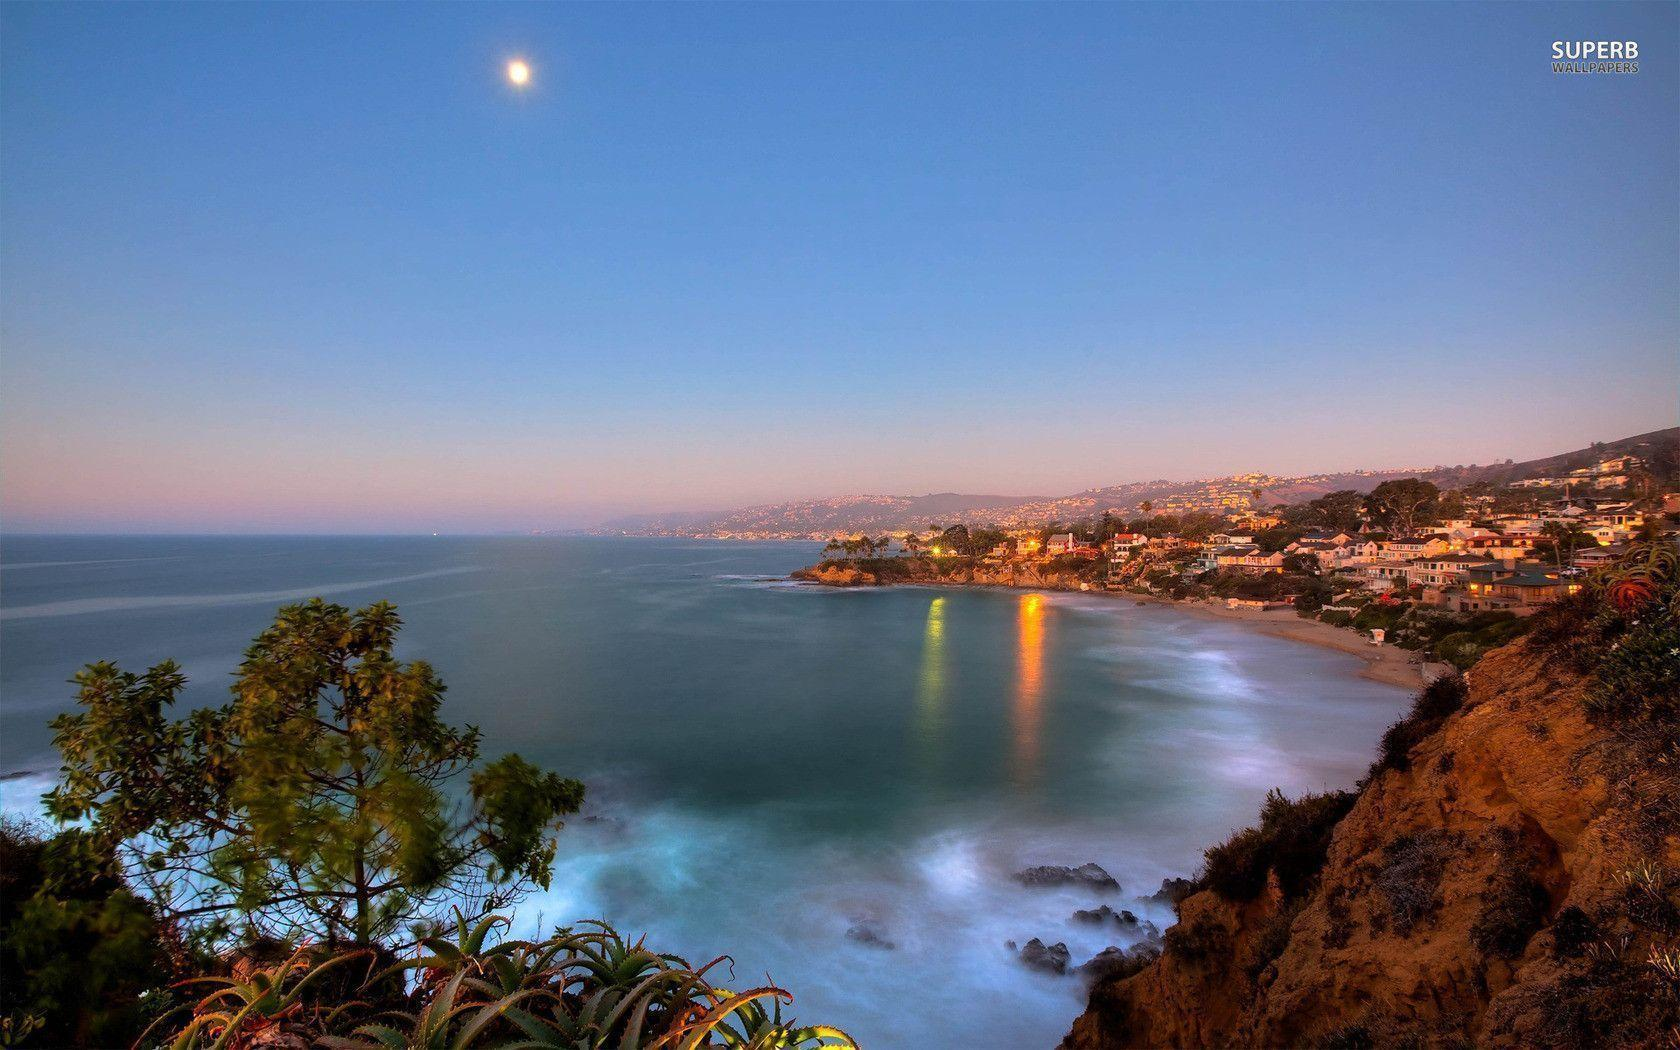 california west coast wallpaper - photo #24